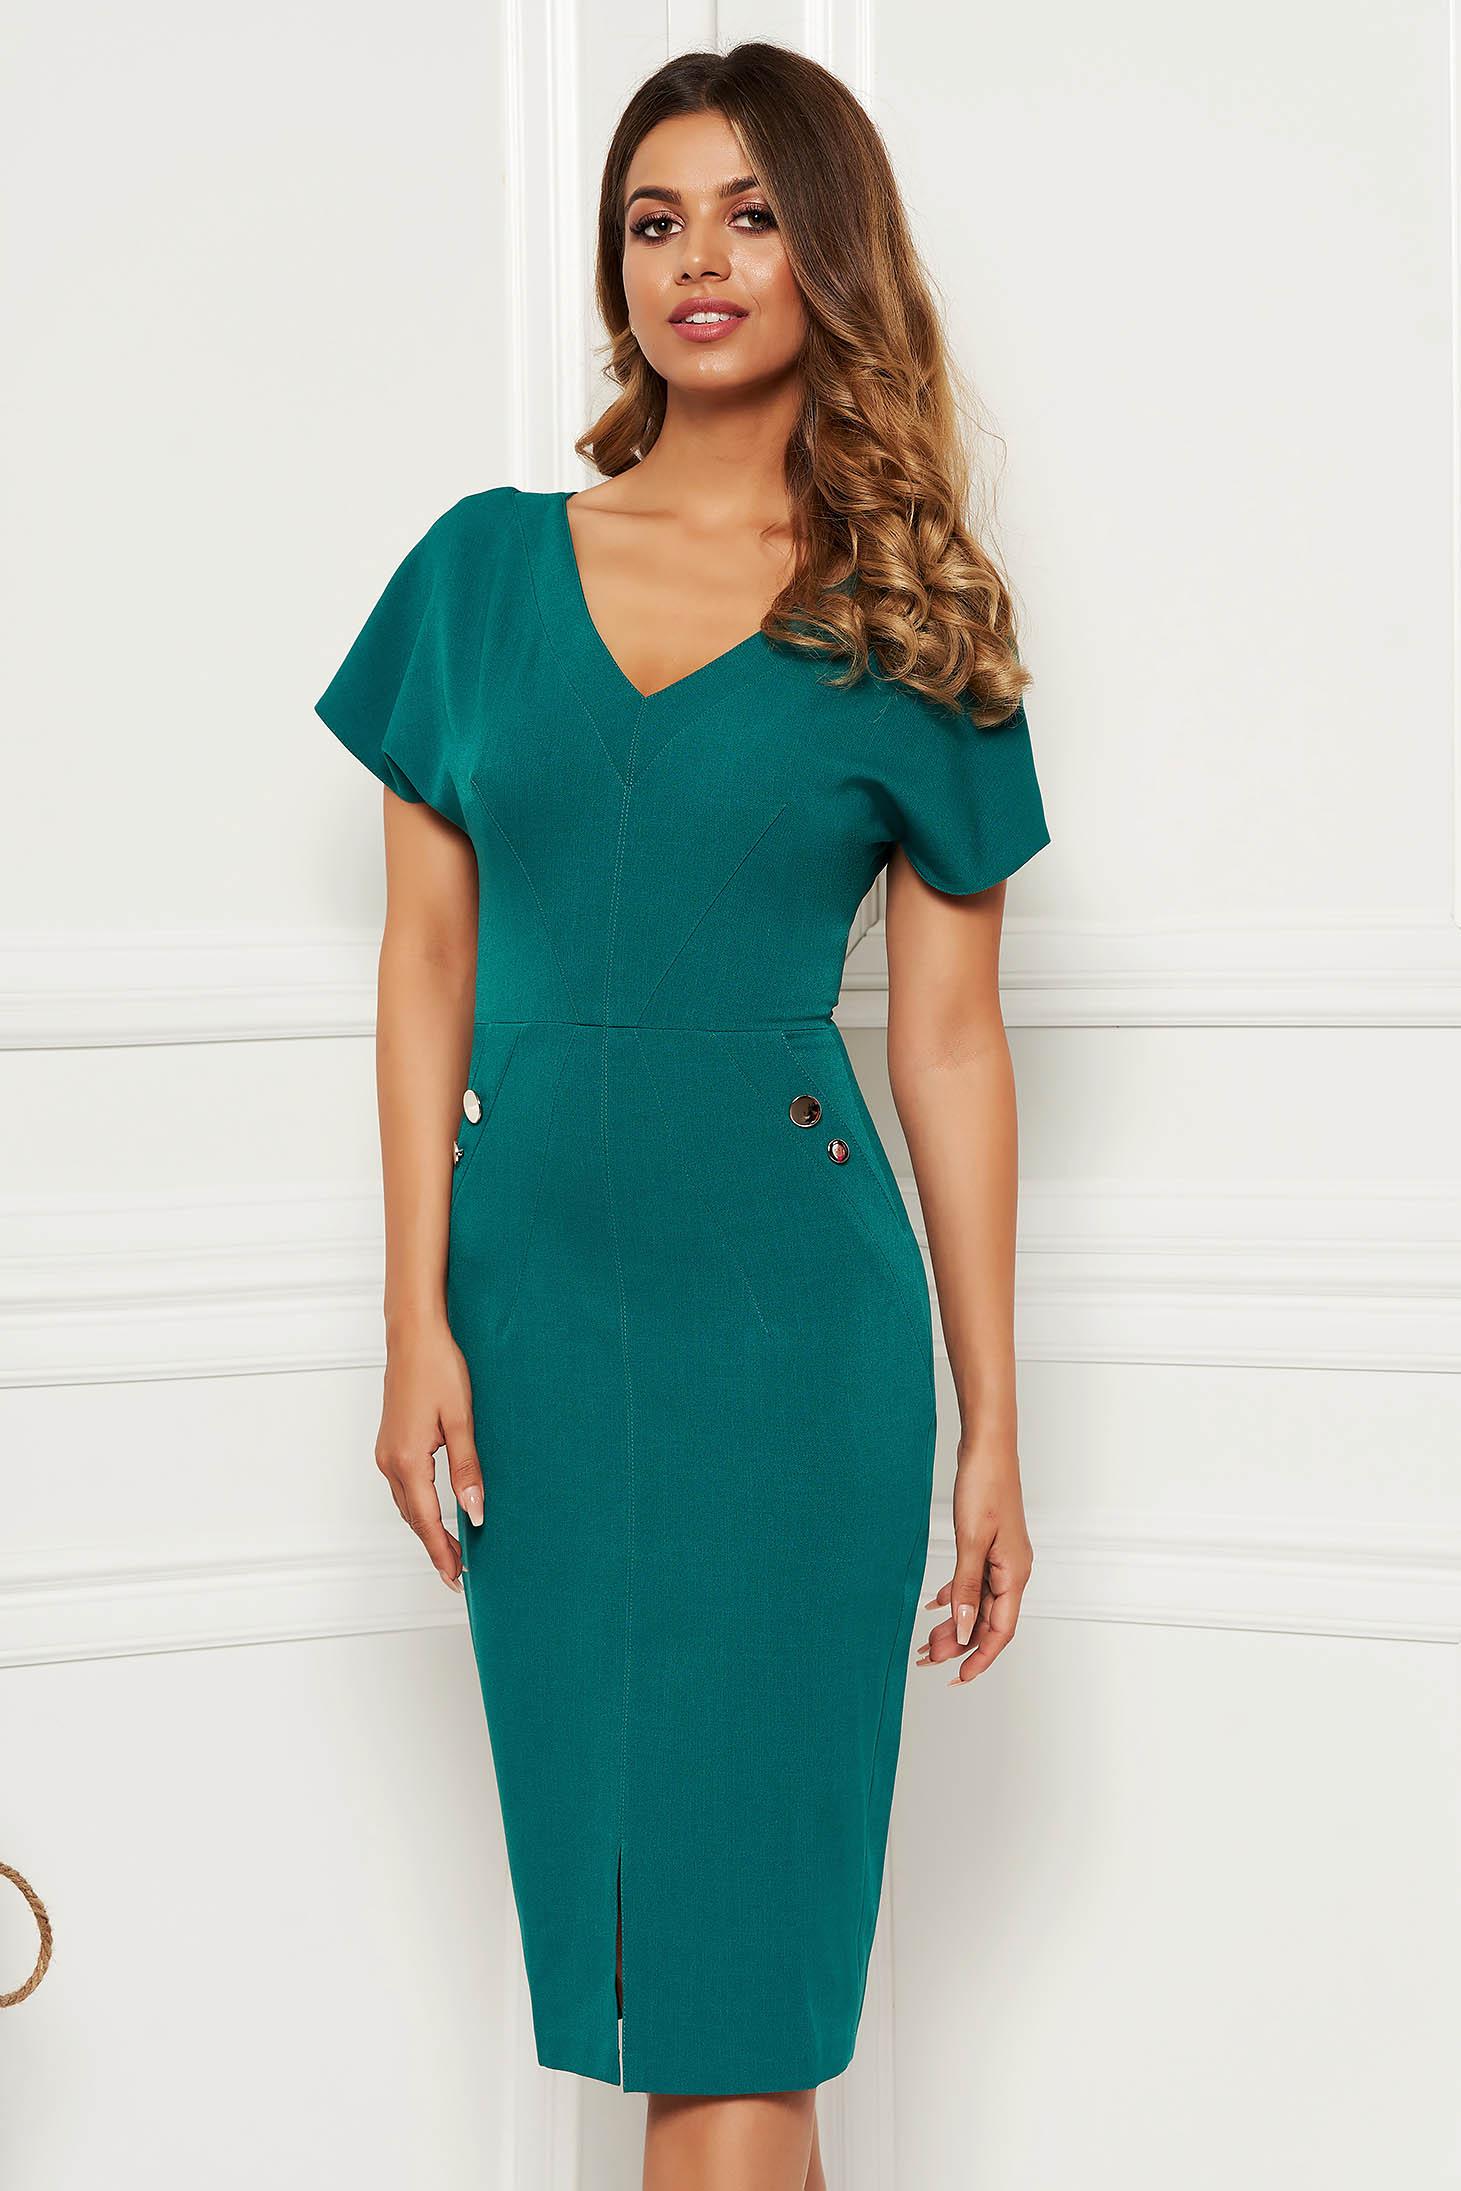 Rochie verde office midi tip creion din stofa usor elastica captusita pe interior accesorizata cu nasturi